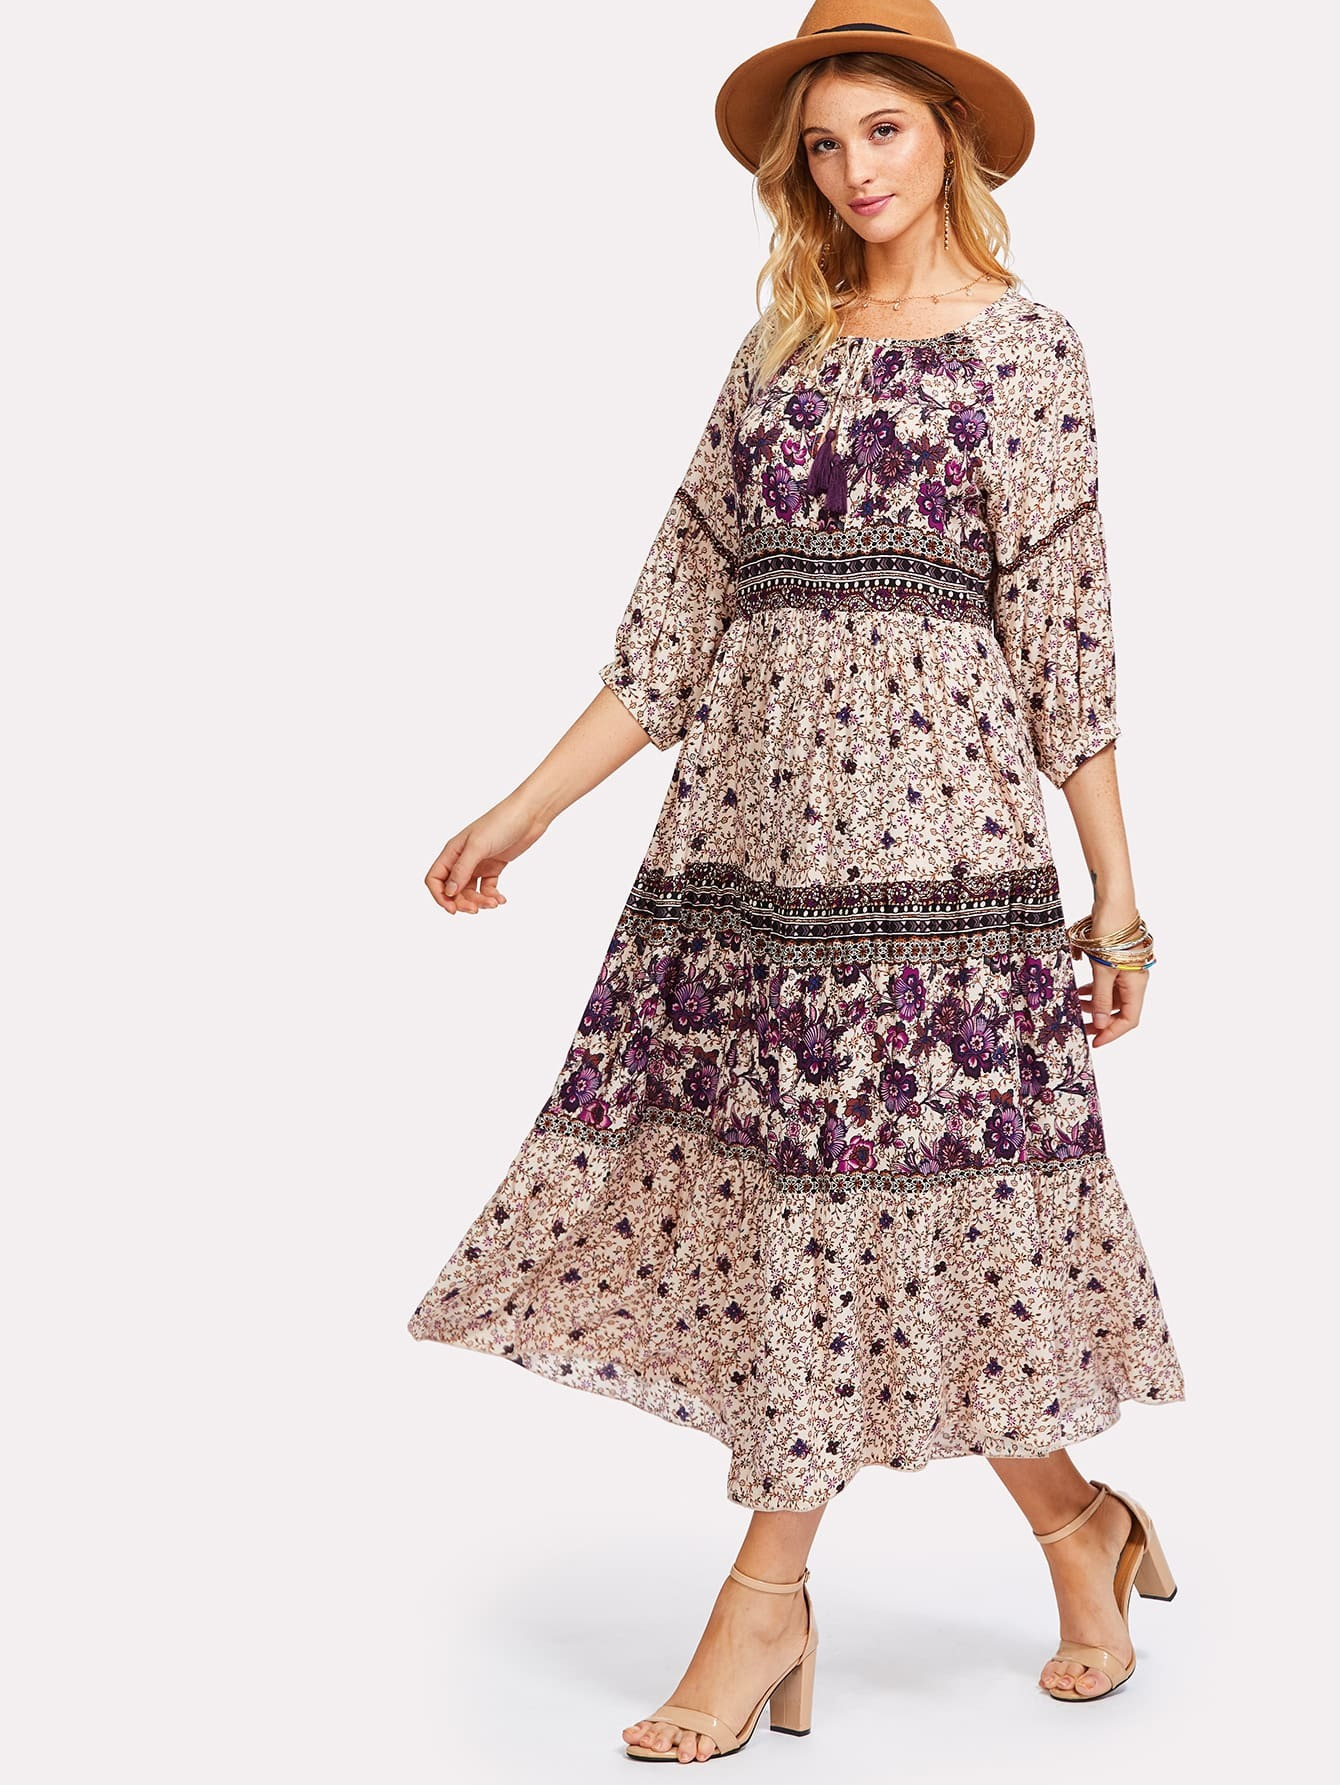 Tassel Tied Neck Flower Print Dress